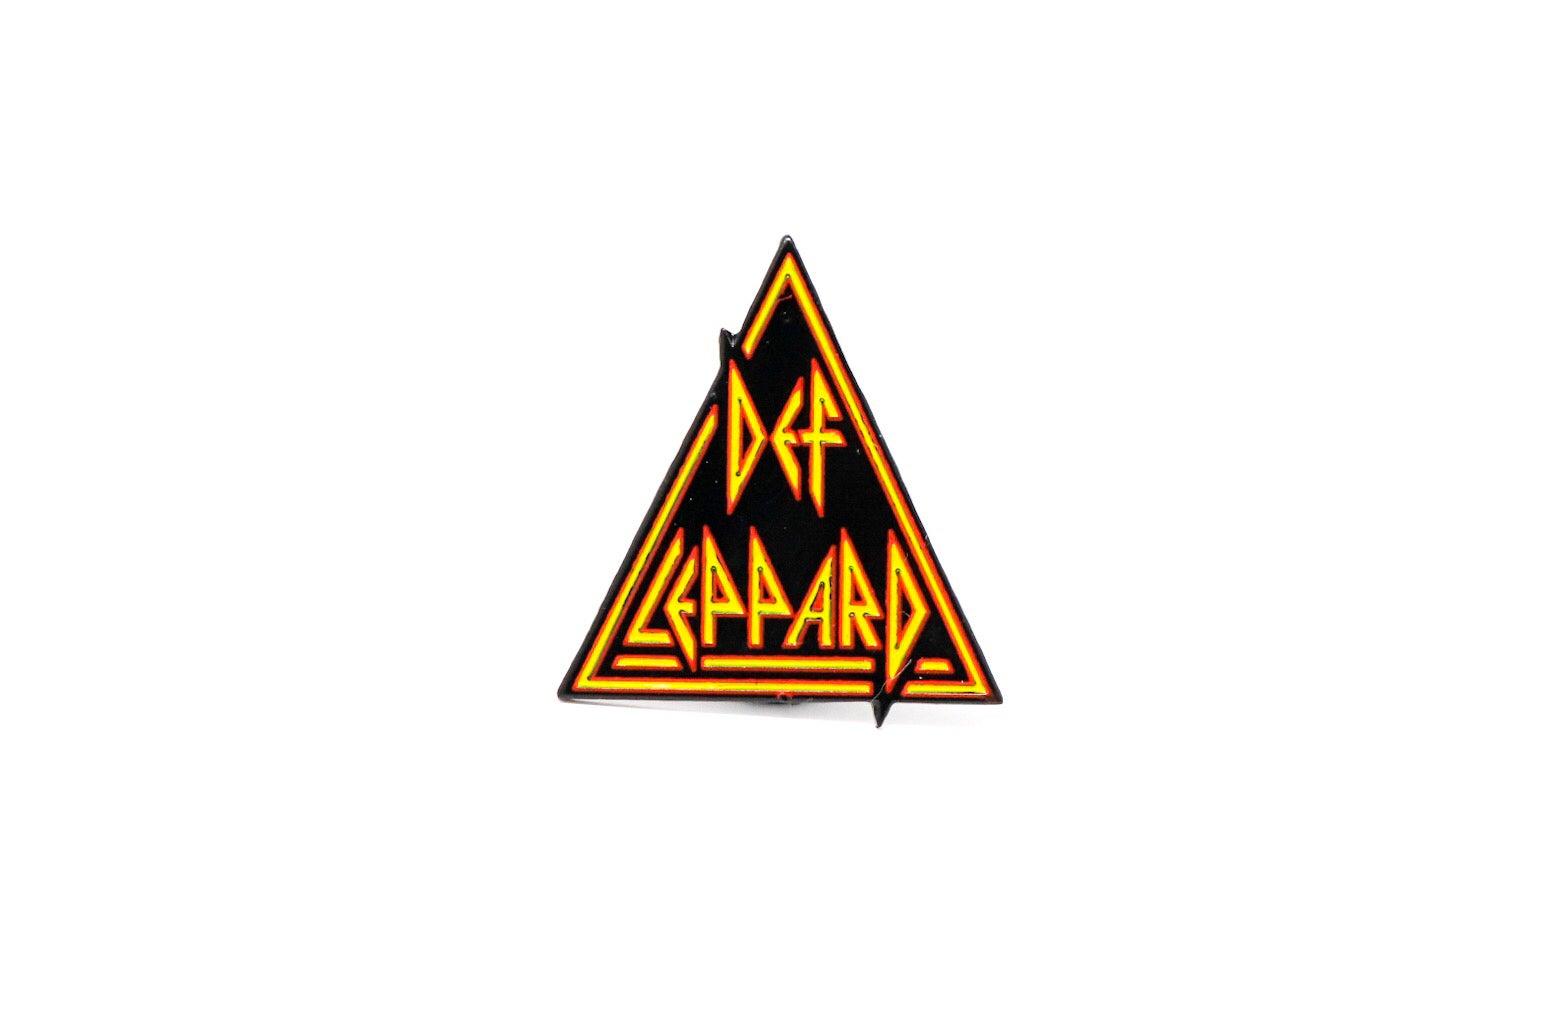 New 3d Wallpaper For Pc Def Leppard Triangle Logo 12701 Tweb